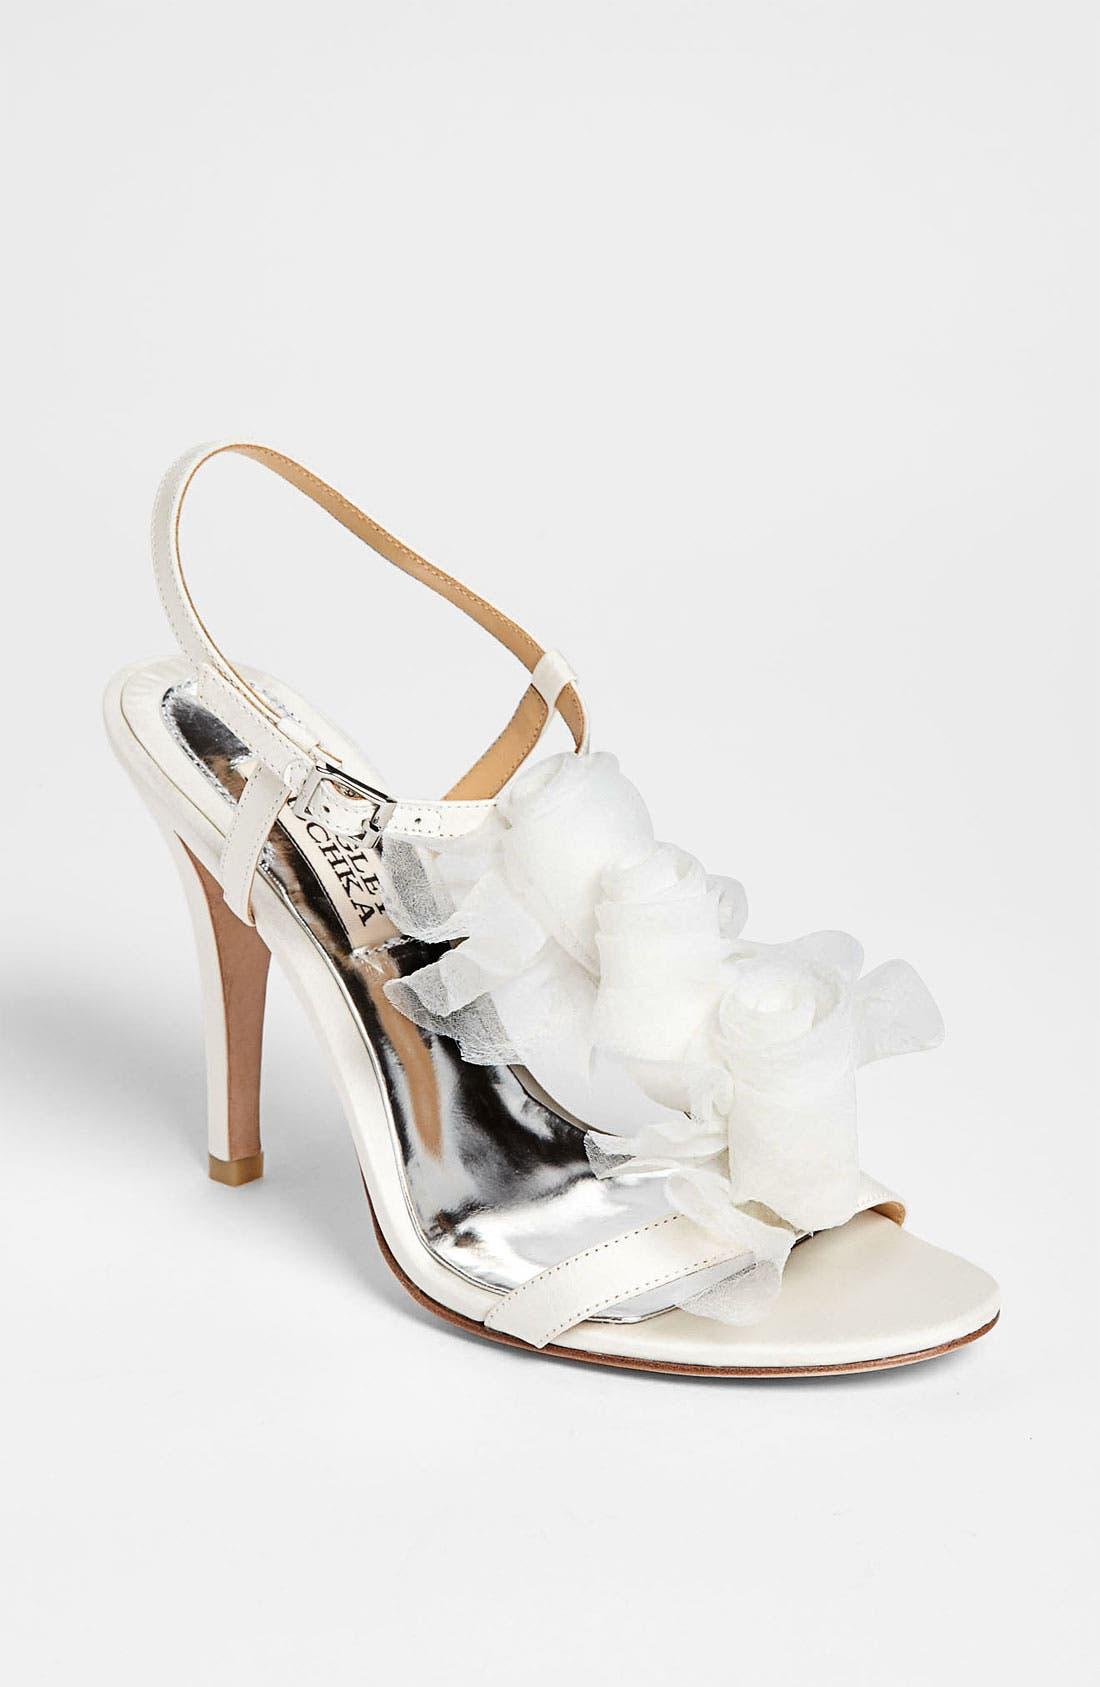 Main Image - Badgley Mischka 'Cissy' Sandal